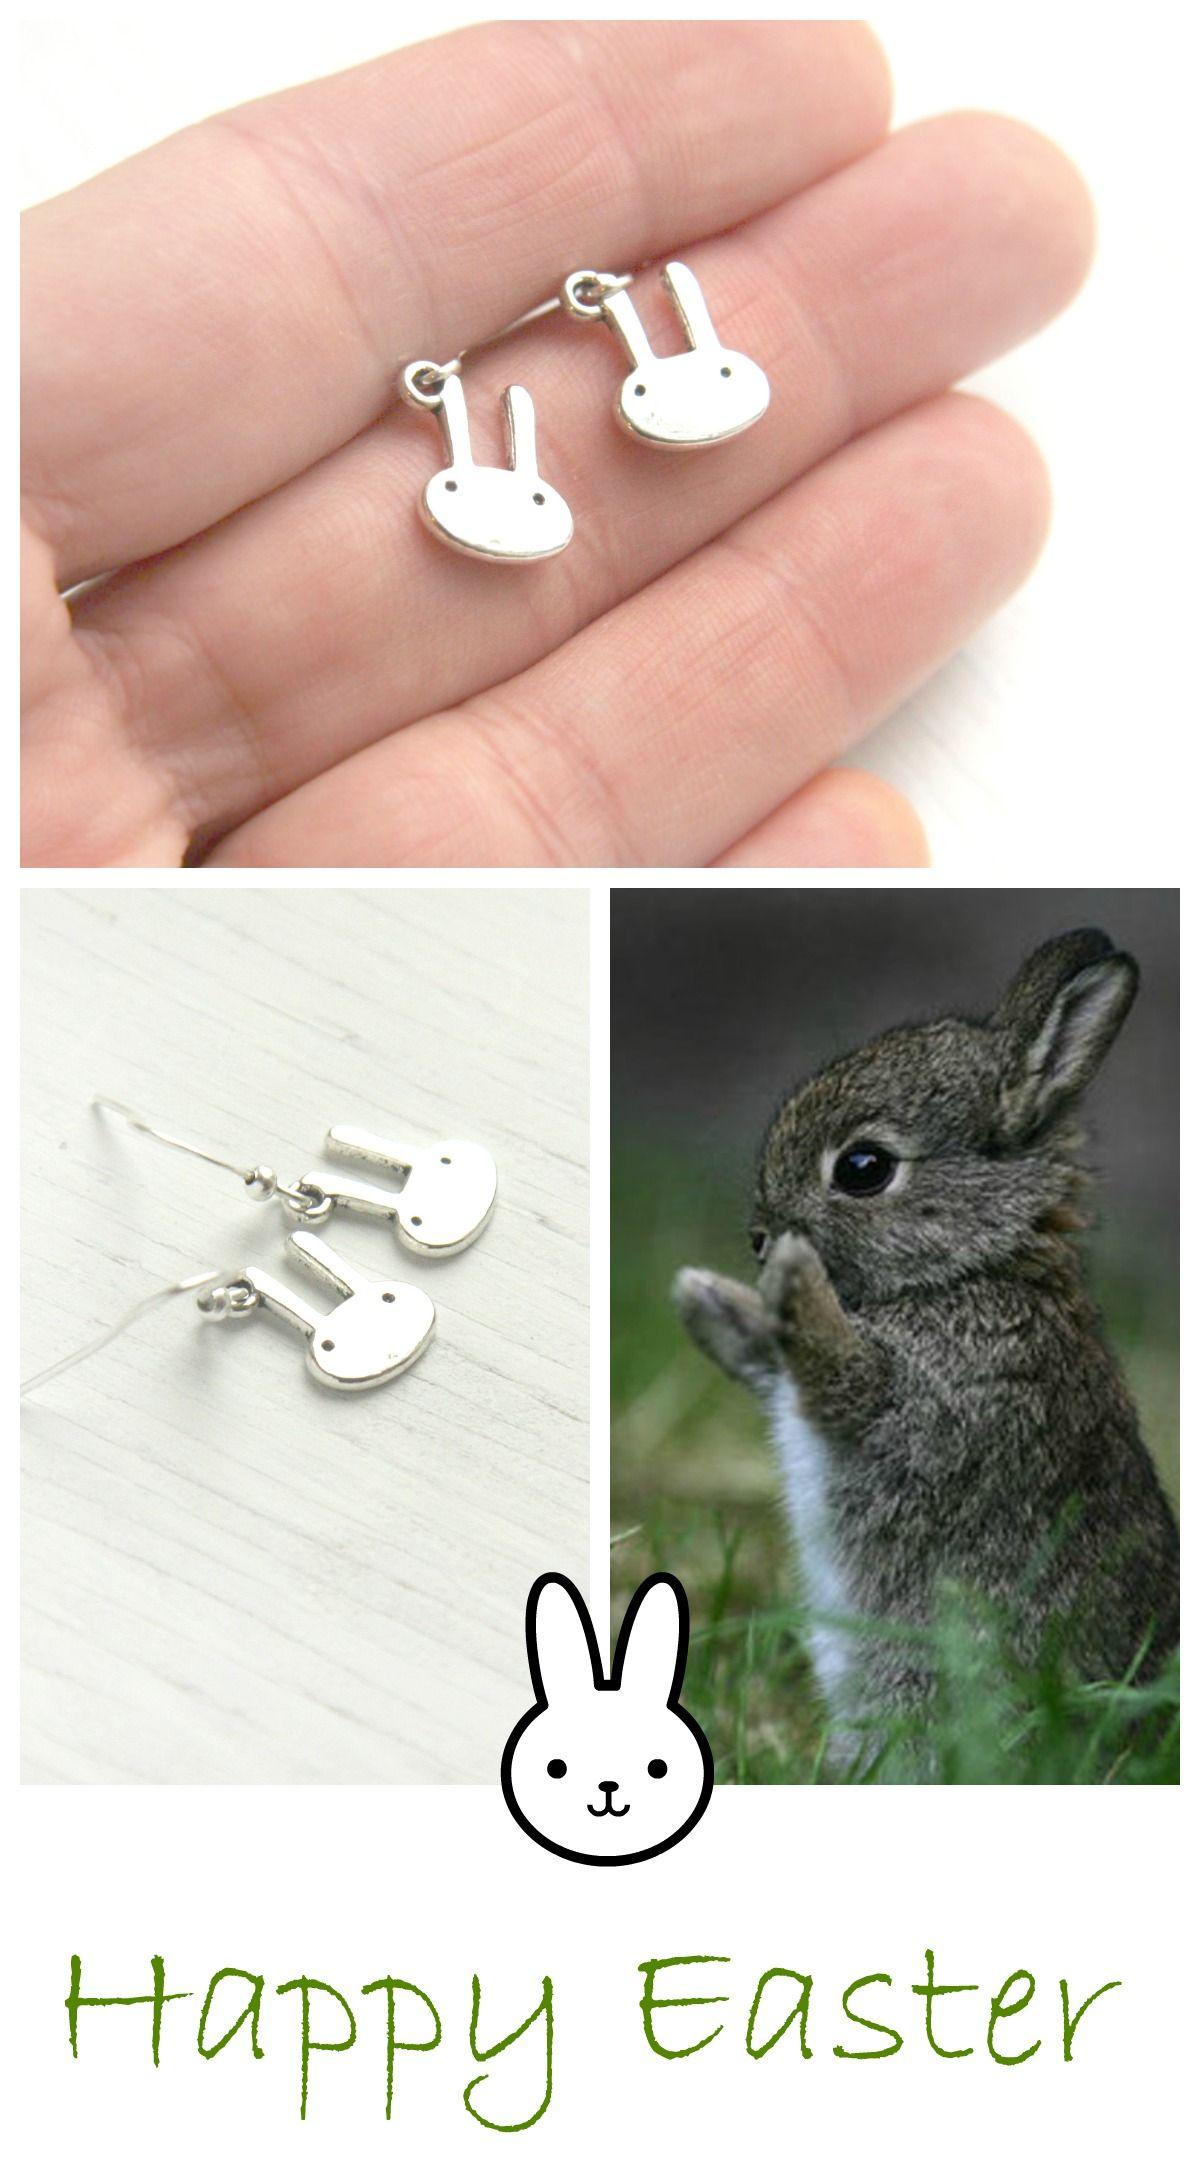 #Cute #Miniature #Bunny #Rabbit - Sterling Silver Dangle Earrings - Tiny, Minimalist Earrings,simple, everyday jewelry #Easter